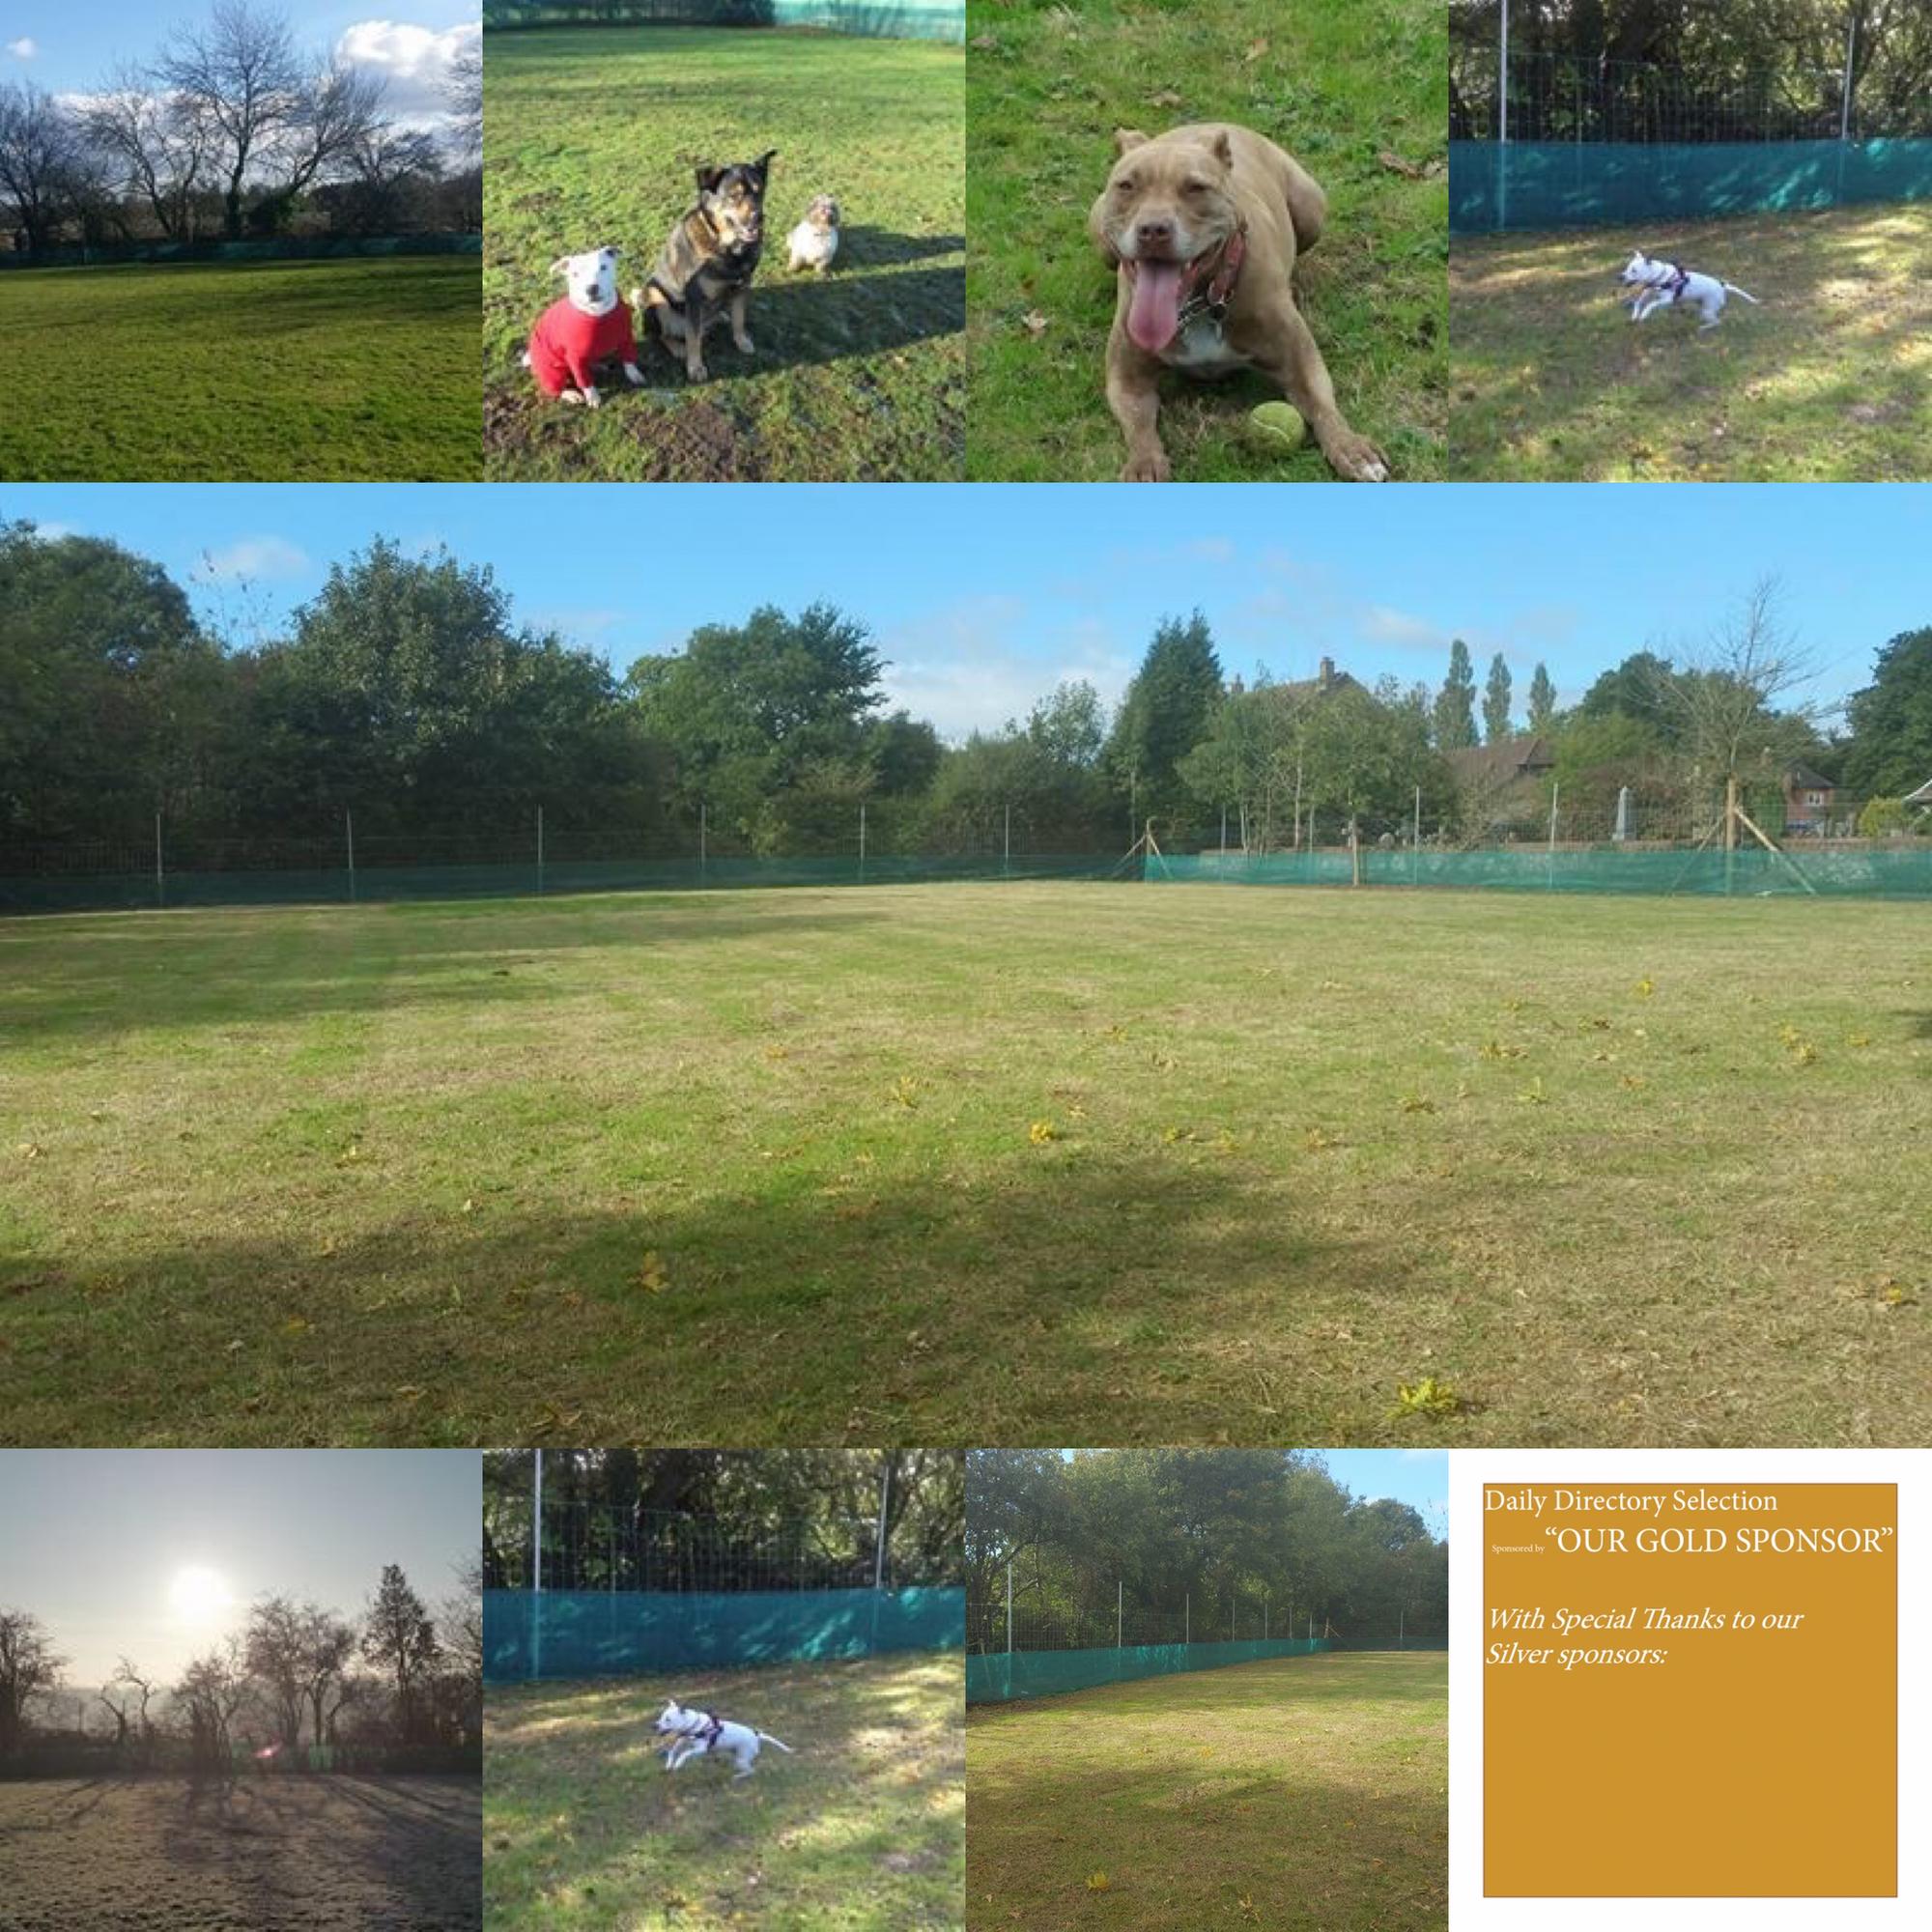 Db Training And Behaviour Enclosed Field Church Lane Headley Kt18 6le Http Www Dbtrainingandbehaviour Co Uk Our Fi Dog Play Area Dog Walking Dog Exercise